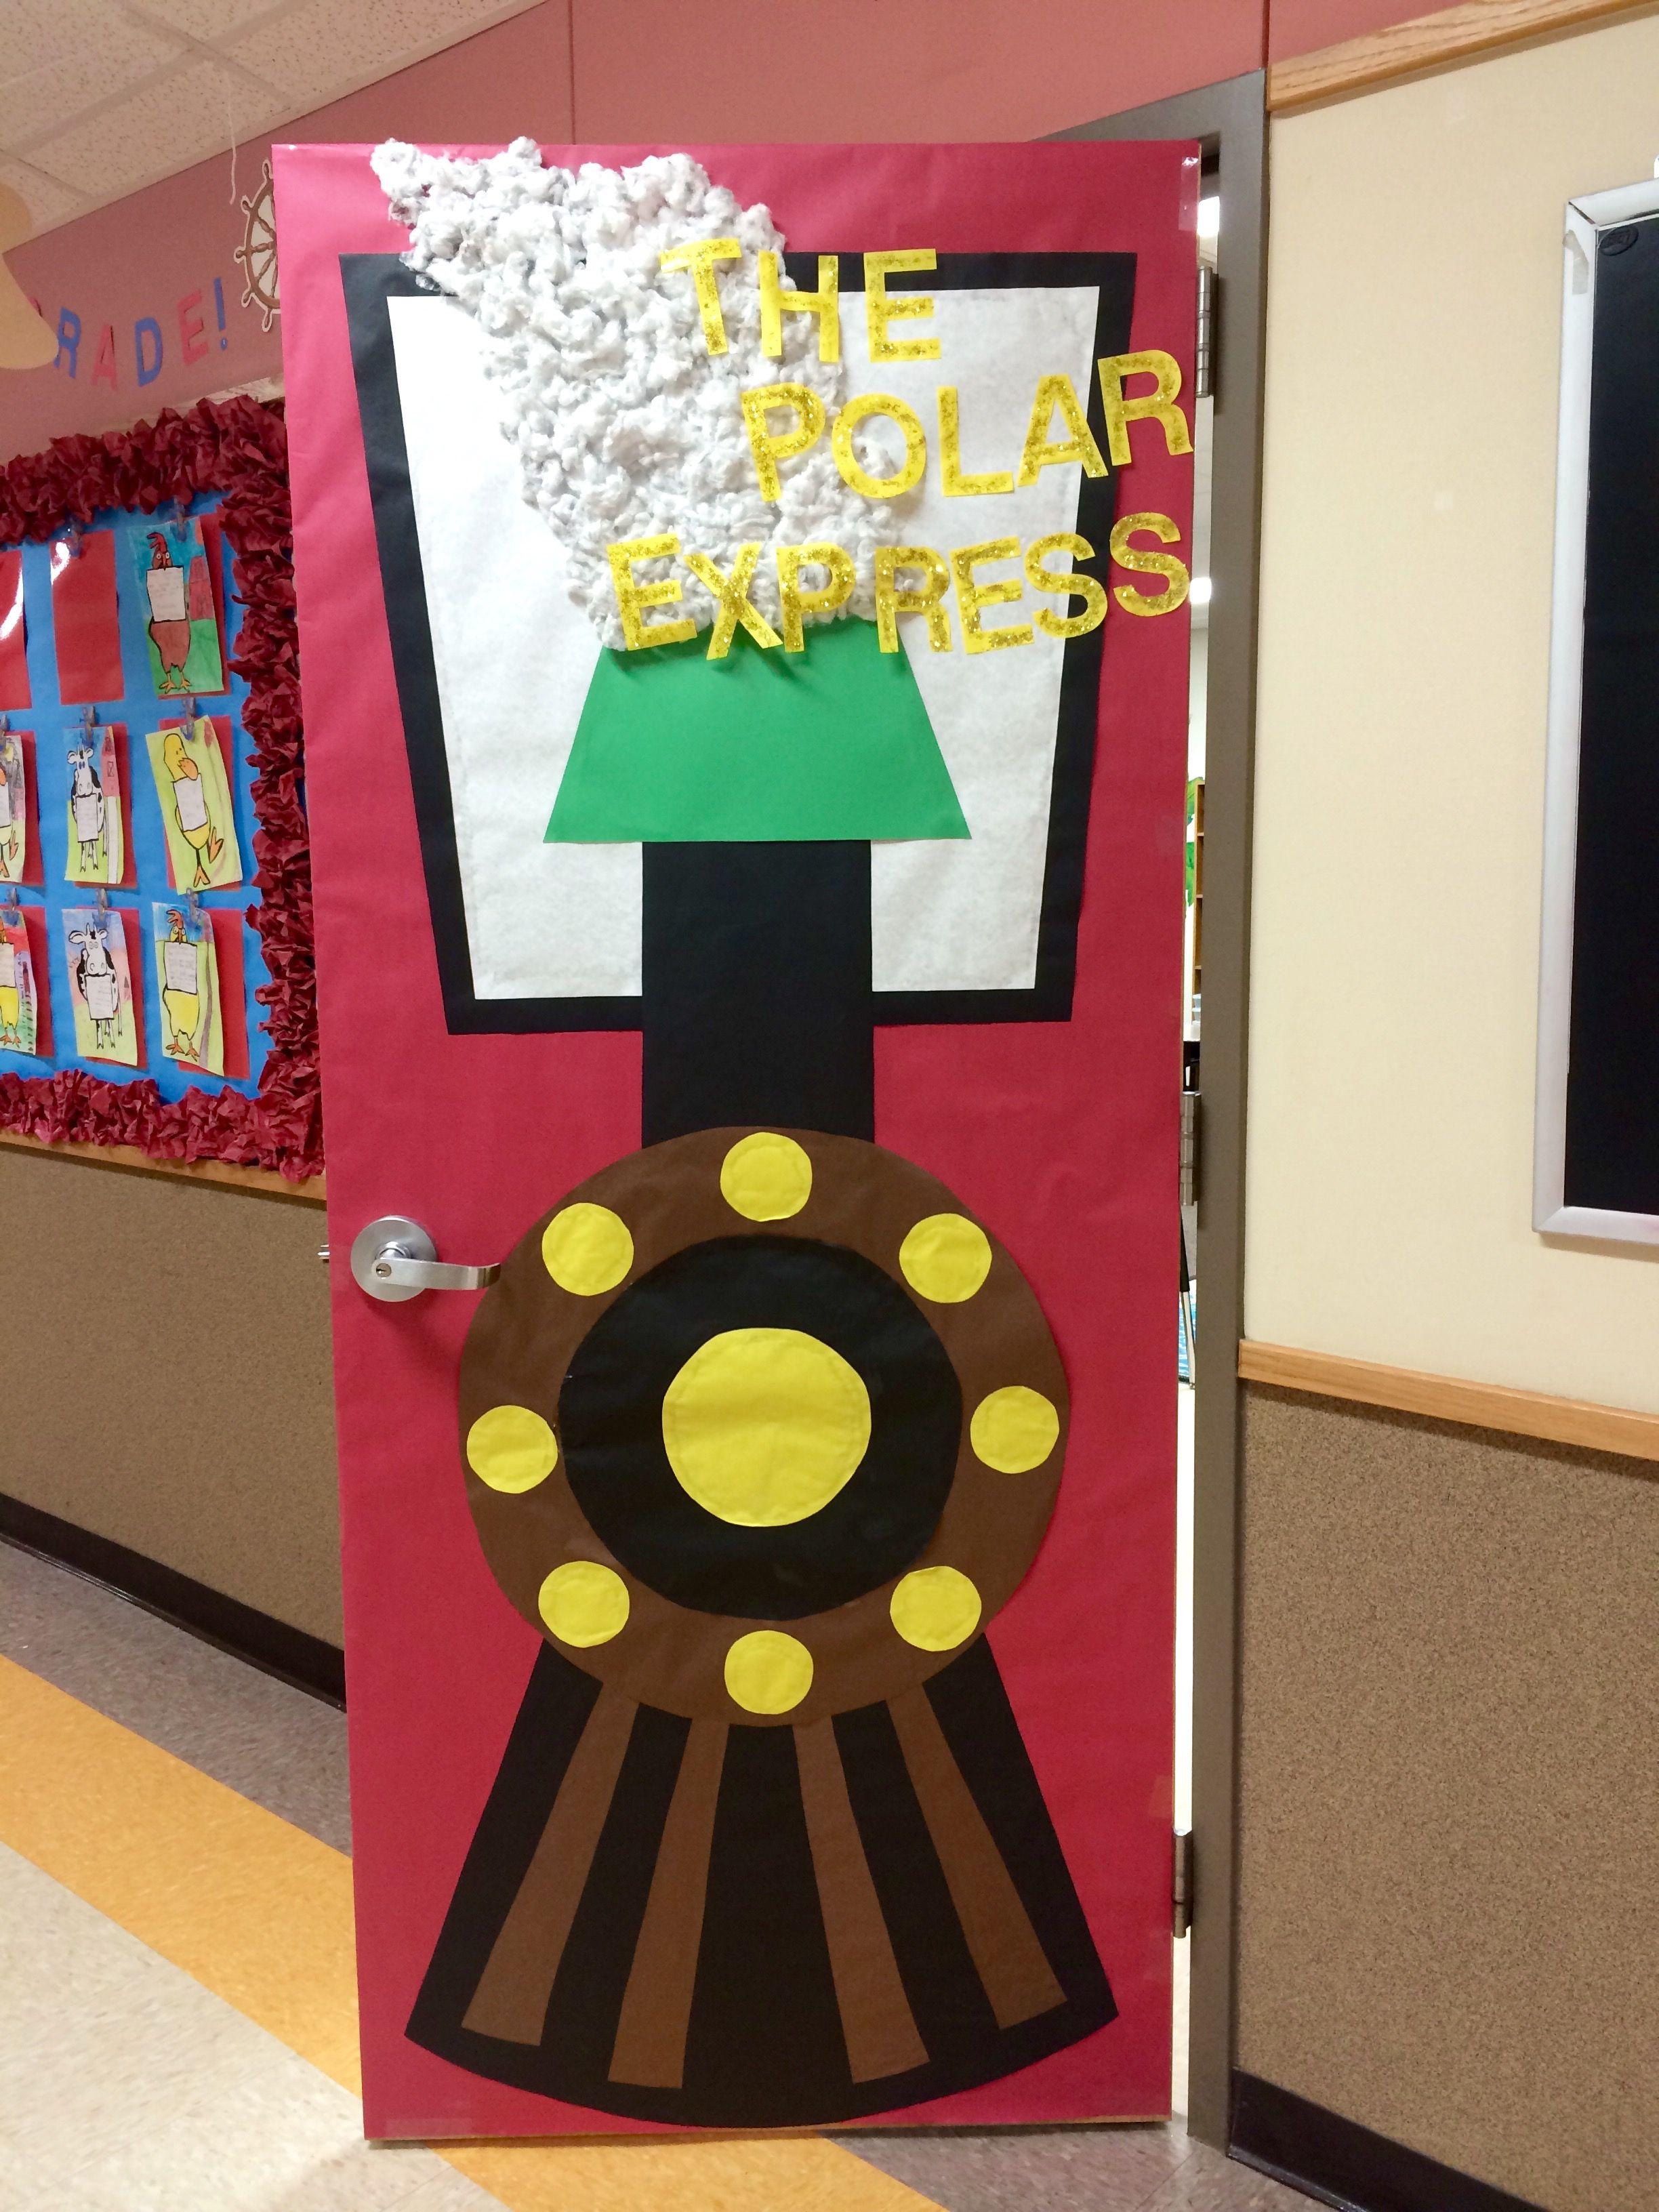 1000+ ideas about School Hallway Decorations on Pinterest ...